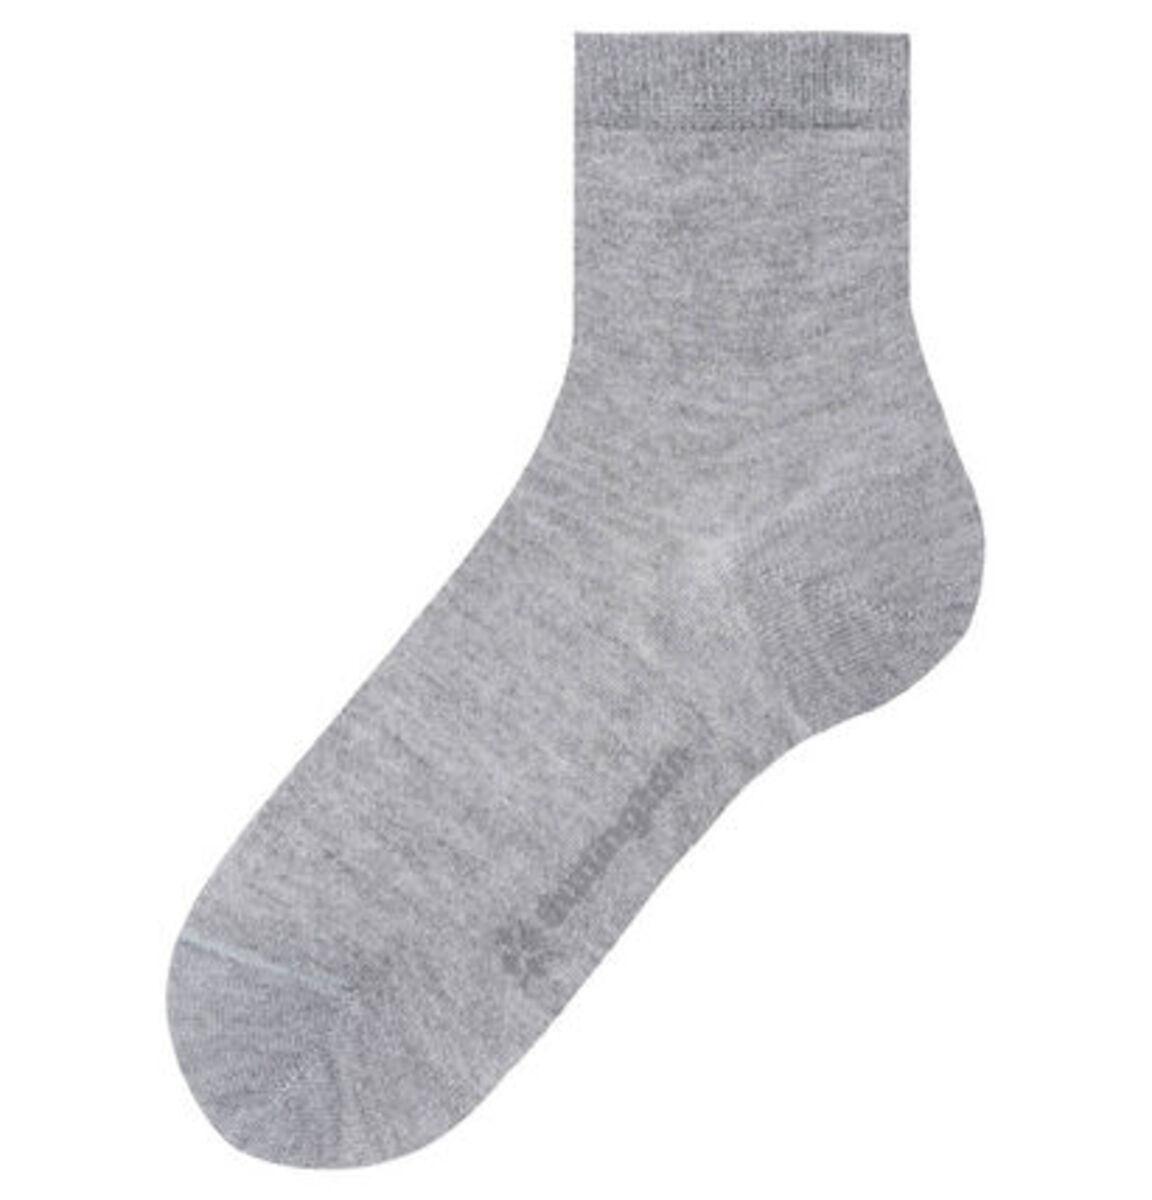 Bild 2 von Burlington Damen Socke, hellgrau meliert, 36-41, 36-41